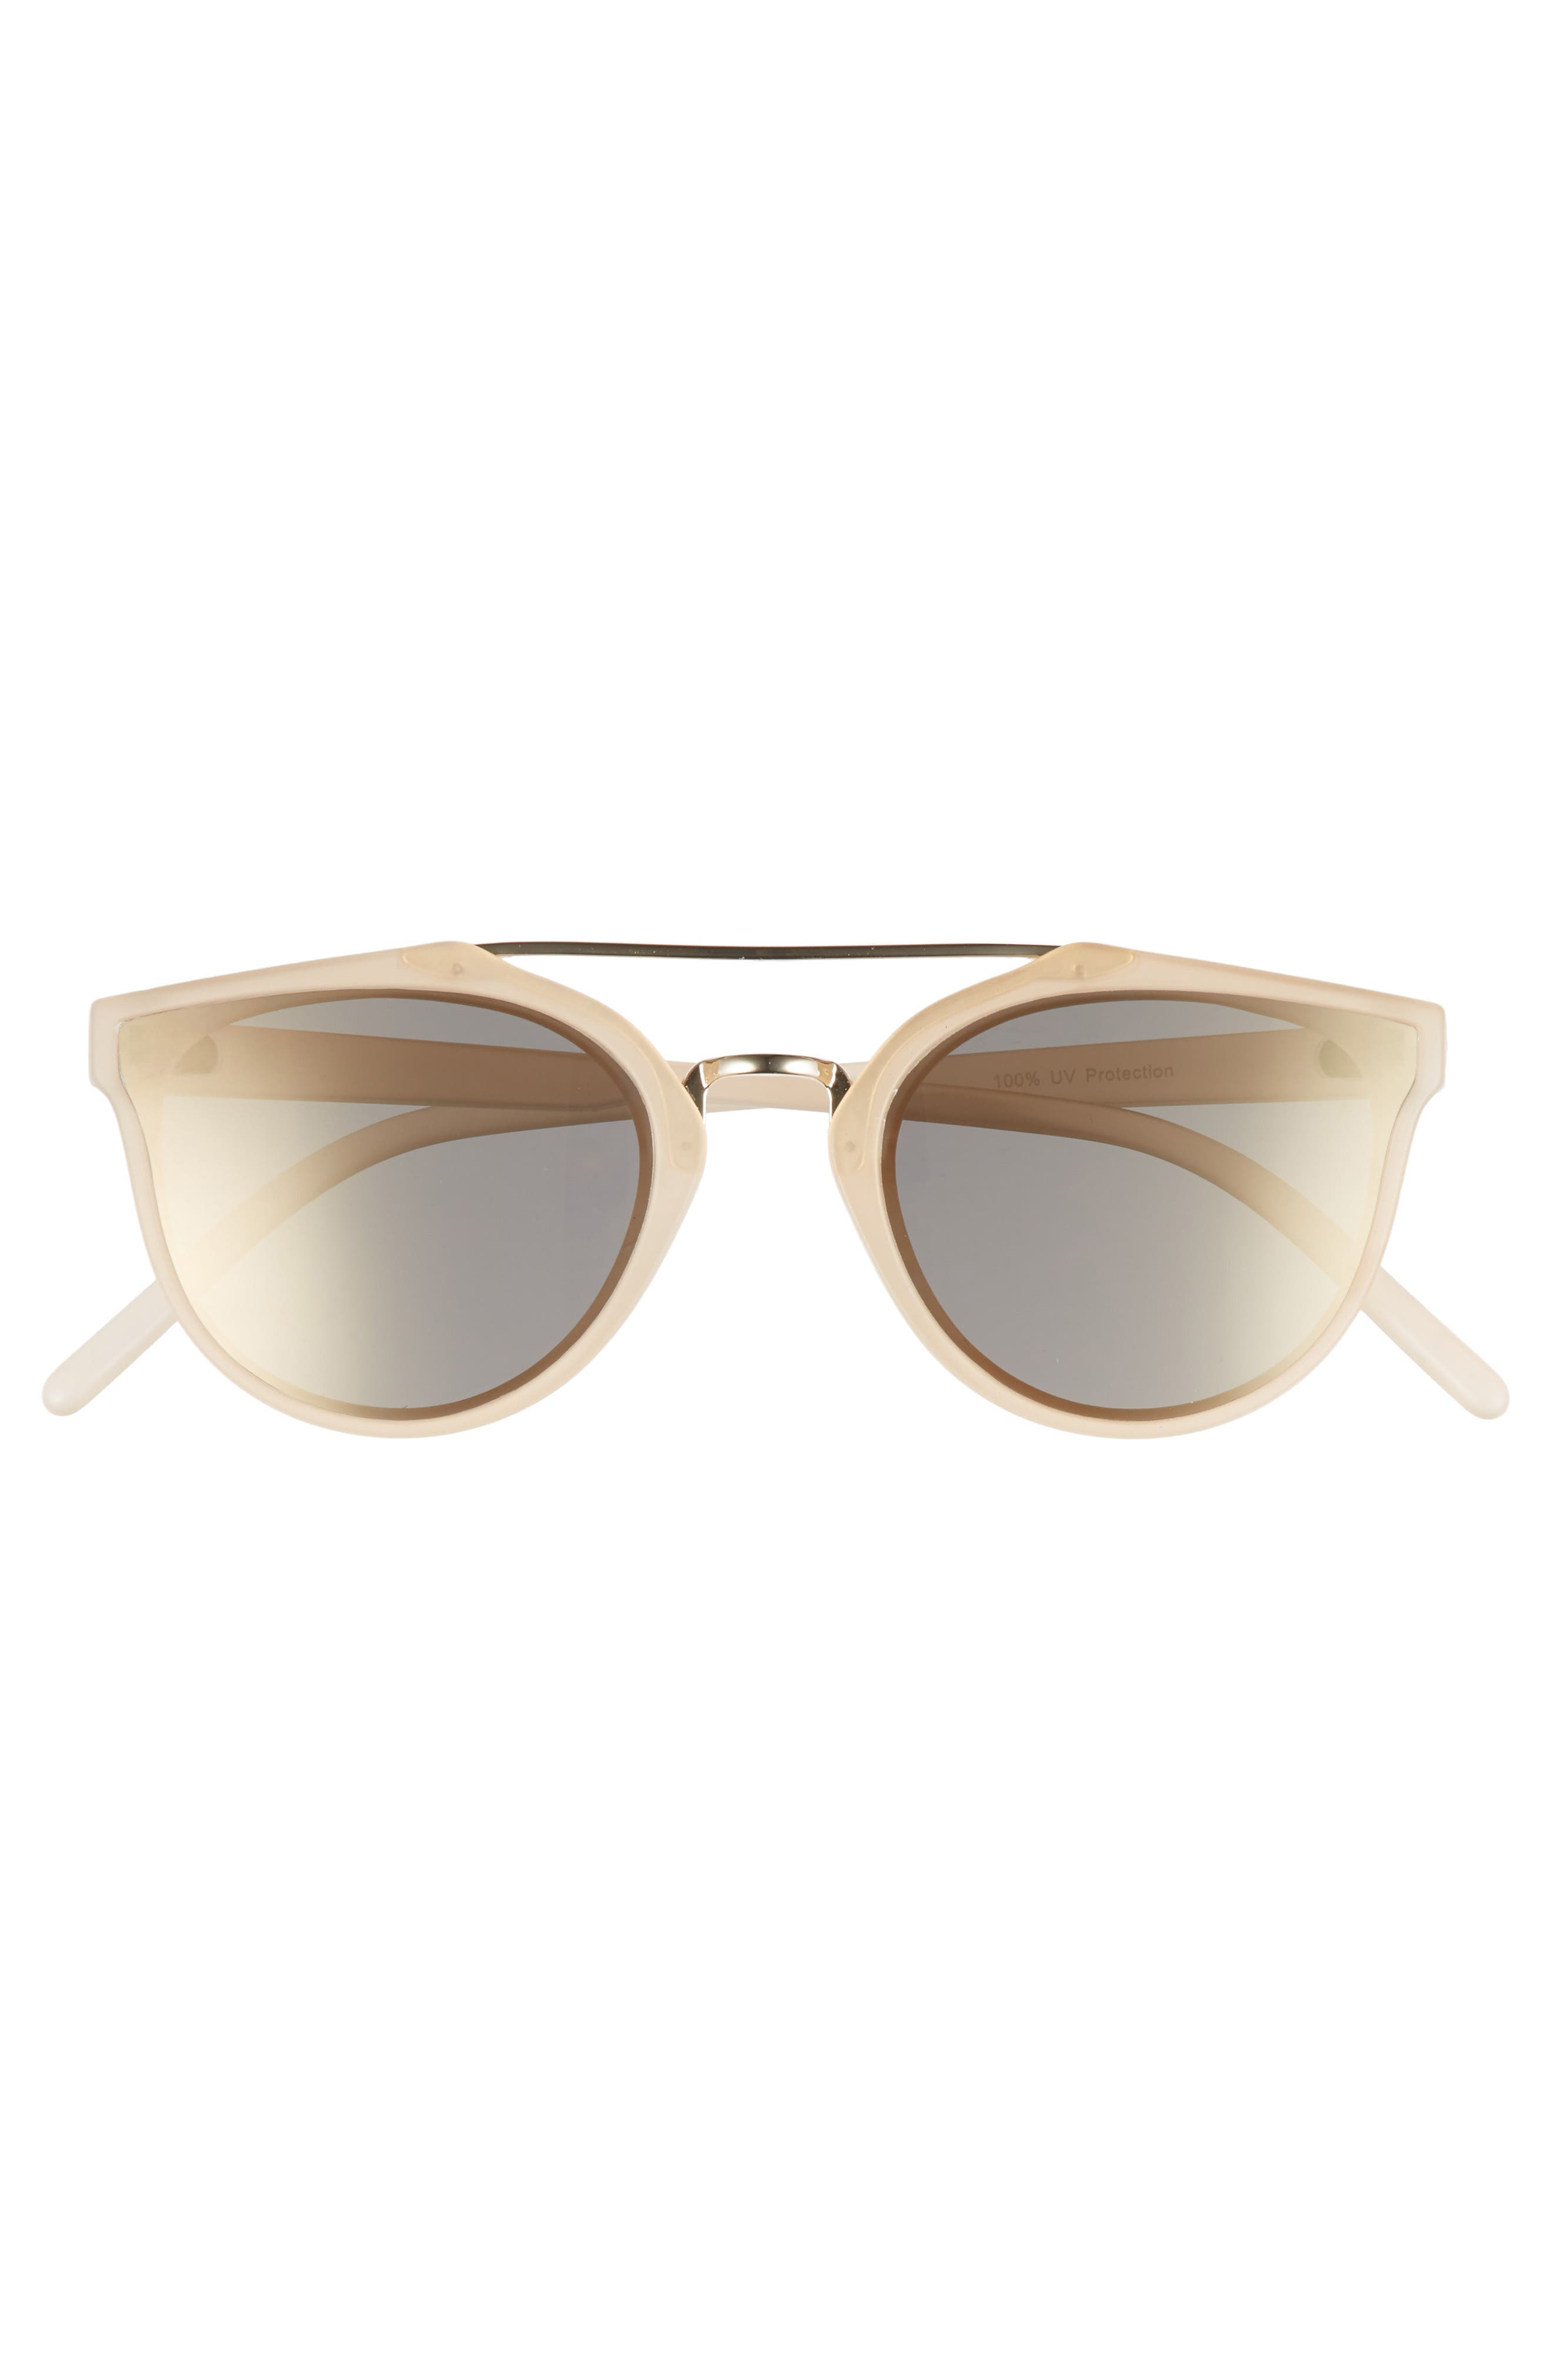 Aviator Sunglasses,                             Alternate thumbnail 3, color,                             950